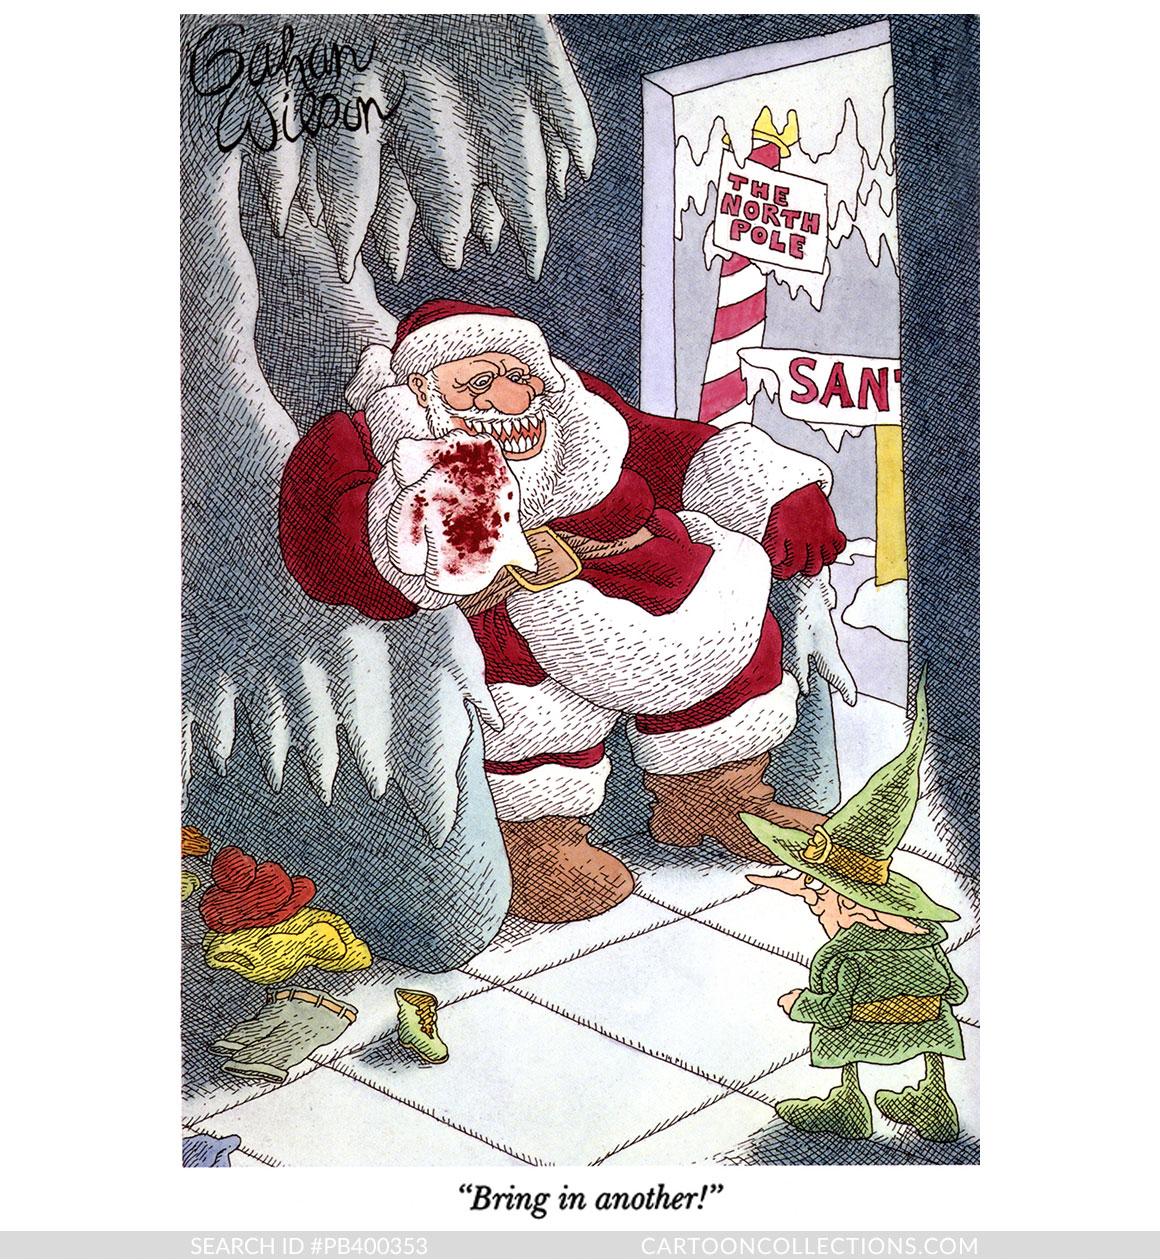 CartoonCollections.com - Bad Santa cartoons - Gahan Wilson